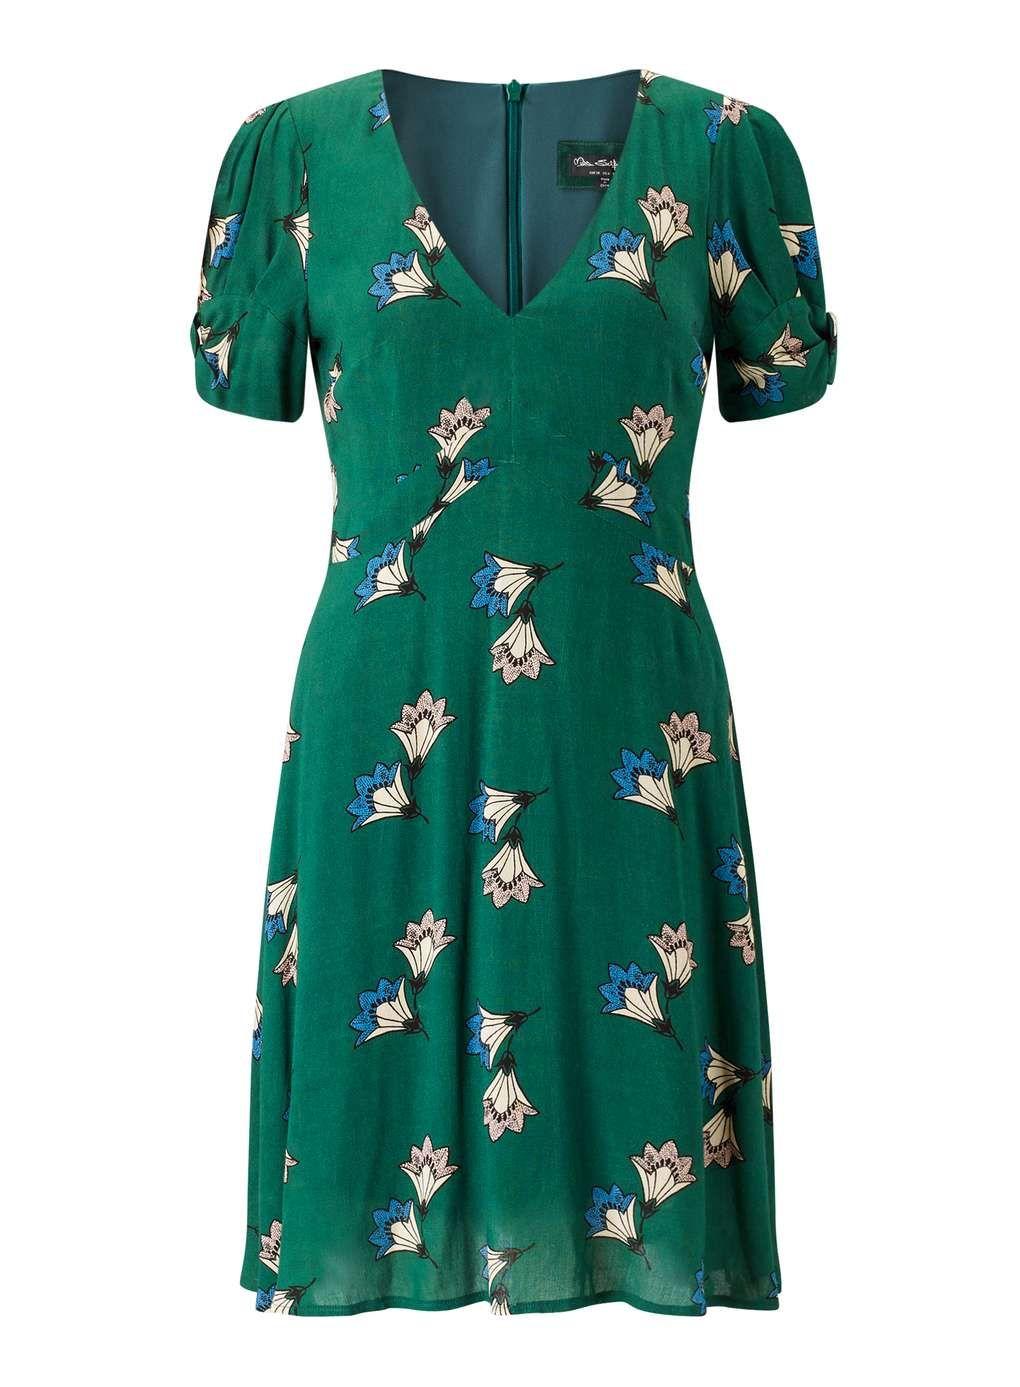 Printed Bow Sleeve Dress - View All - Dress Shop  92654444e